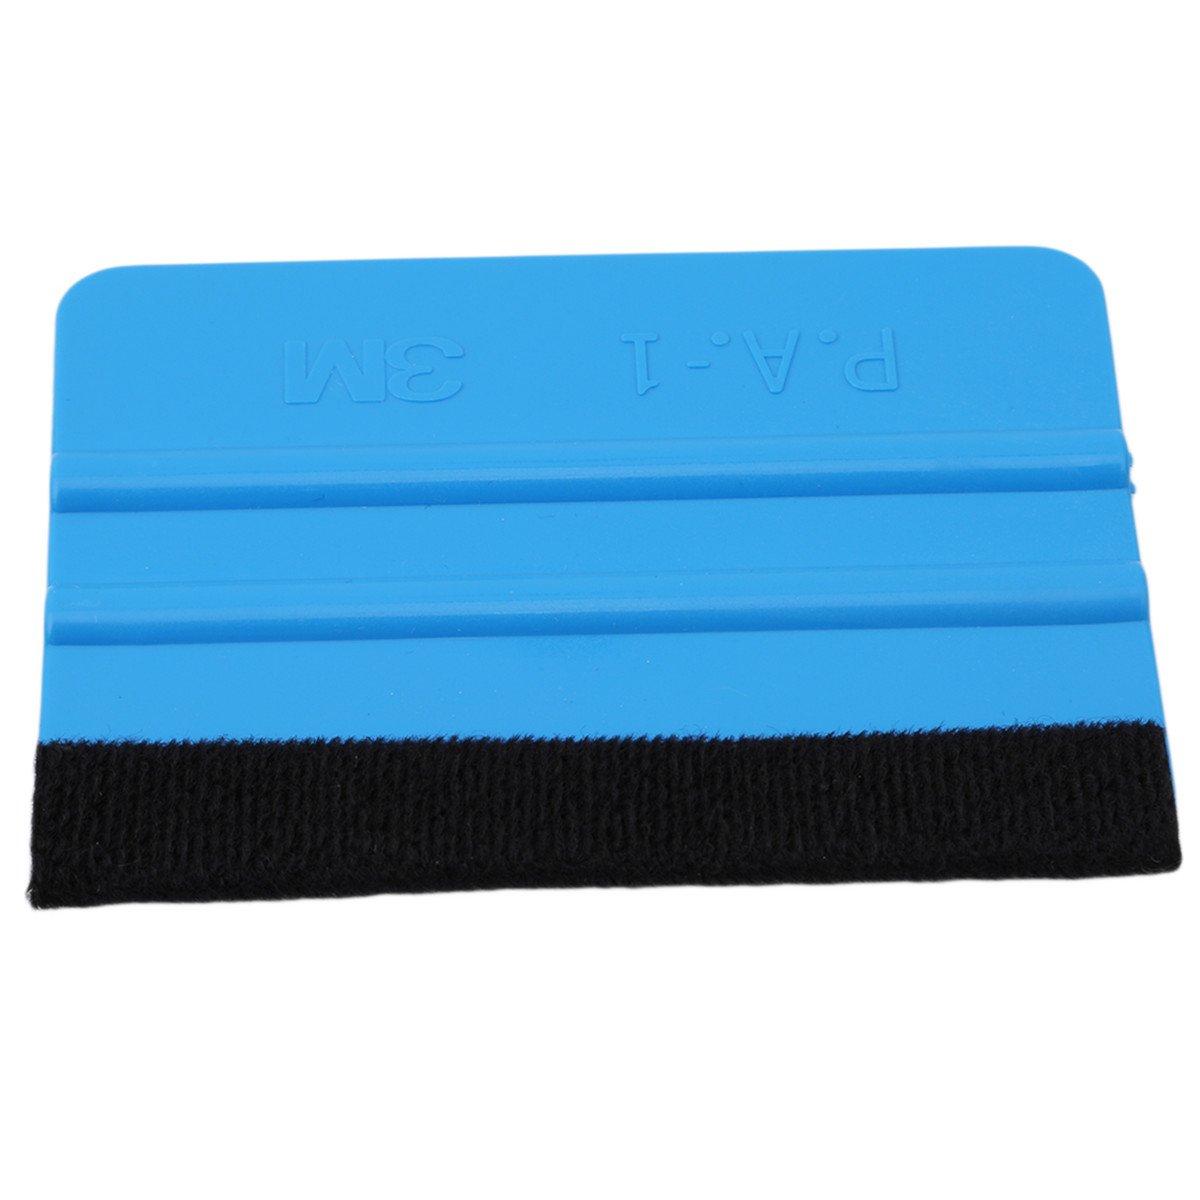 CH 3M Blue Red Felt Edge Squeegee Car Vinyl Wrap Application Tool Scraper Decal (Blue)